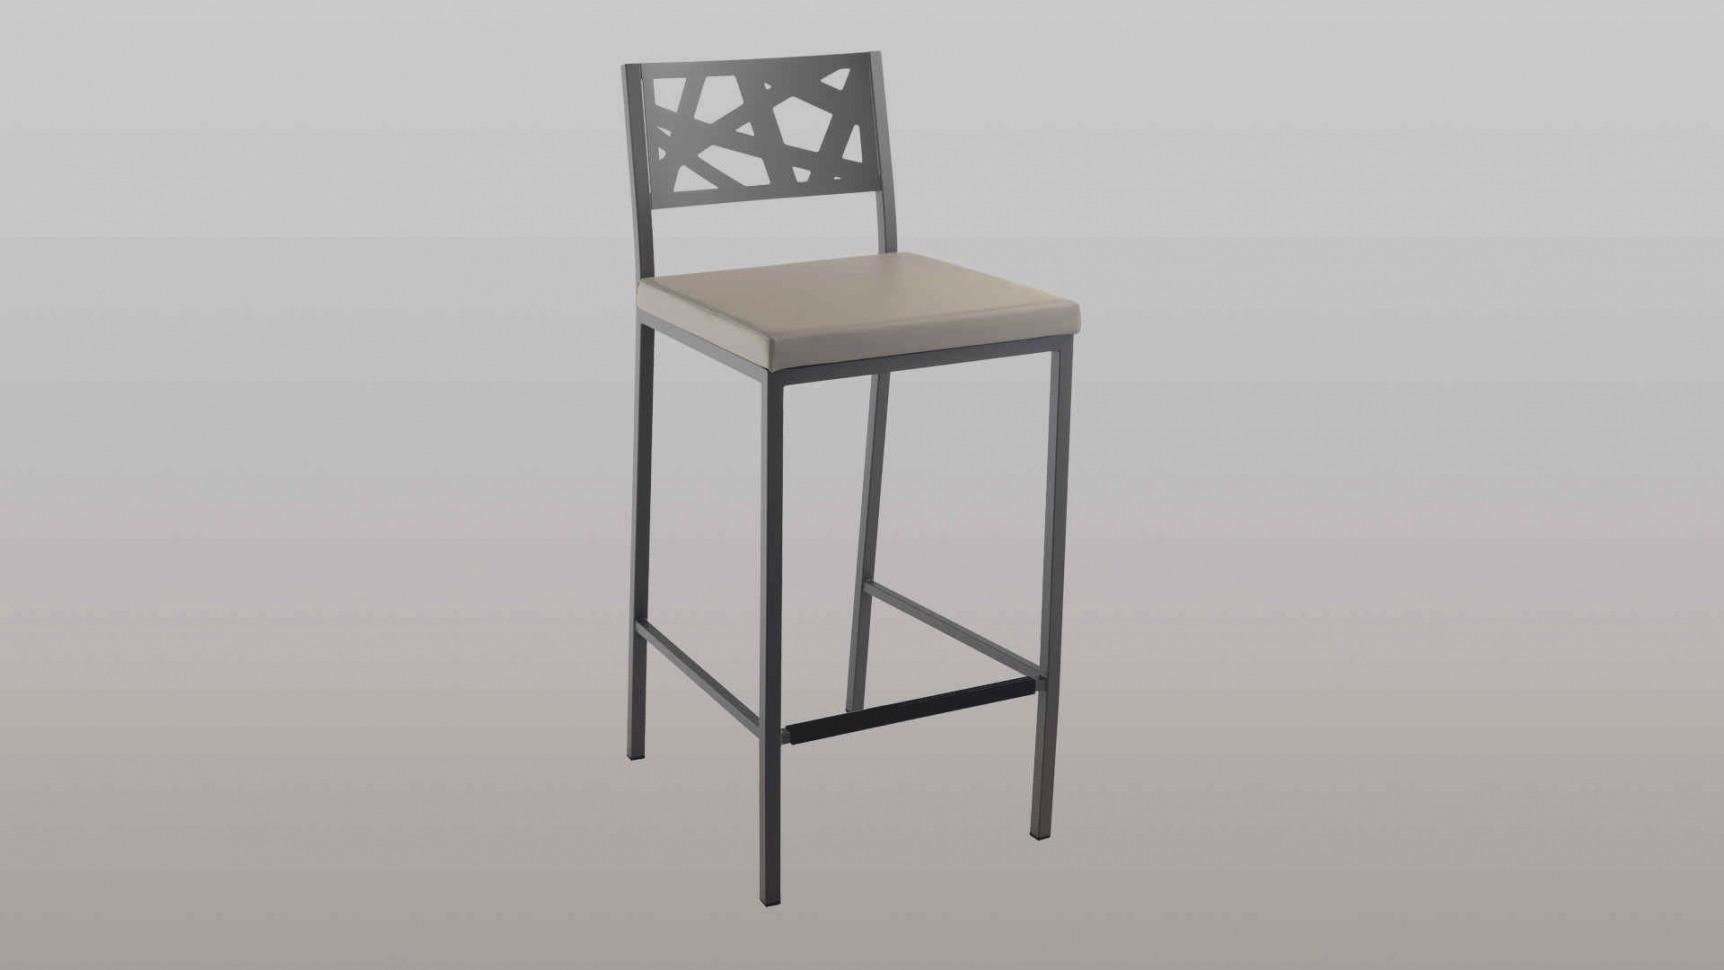 chaise haute bebe alinea incroyable but chaise haute affordable chaise haute bebe alinea best of chaise haute bebe alinea